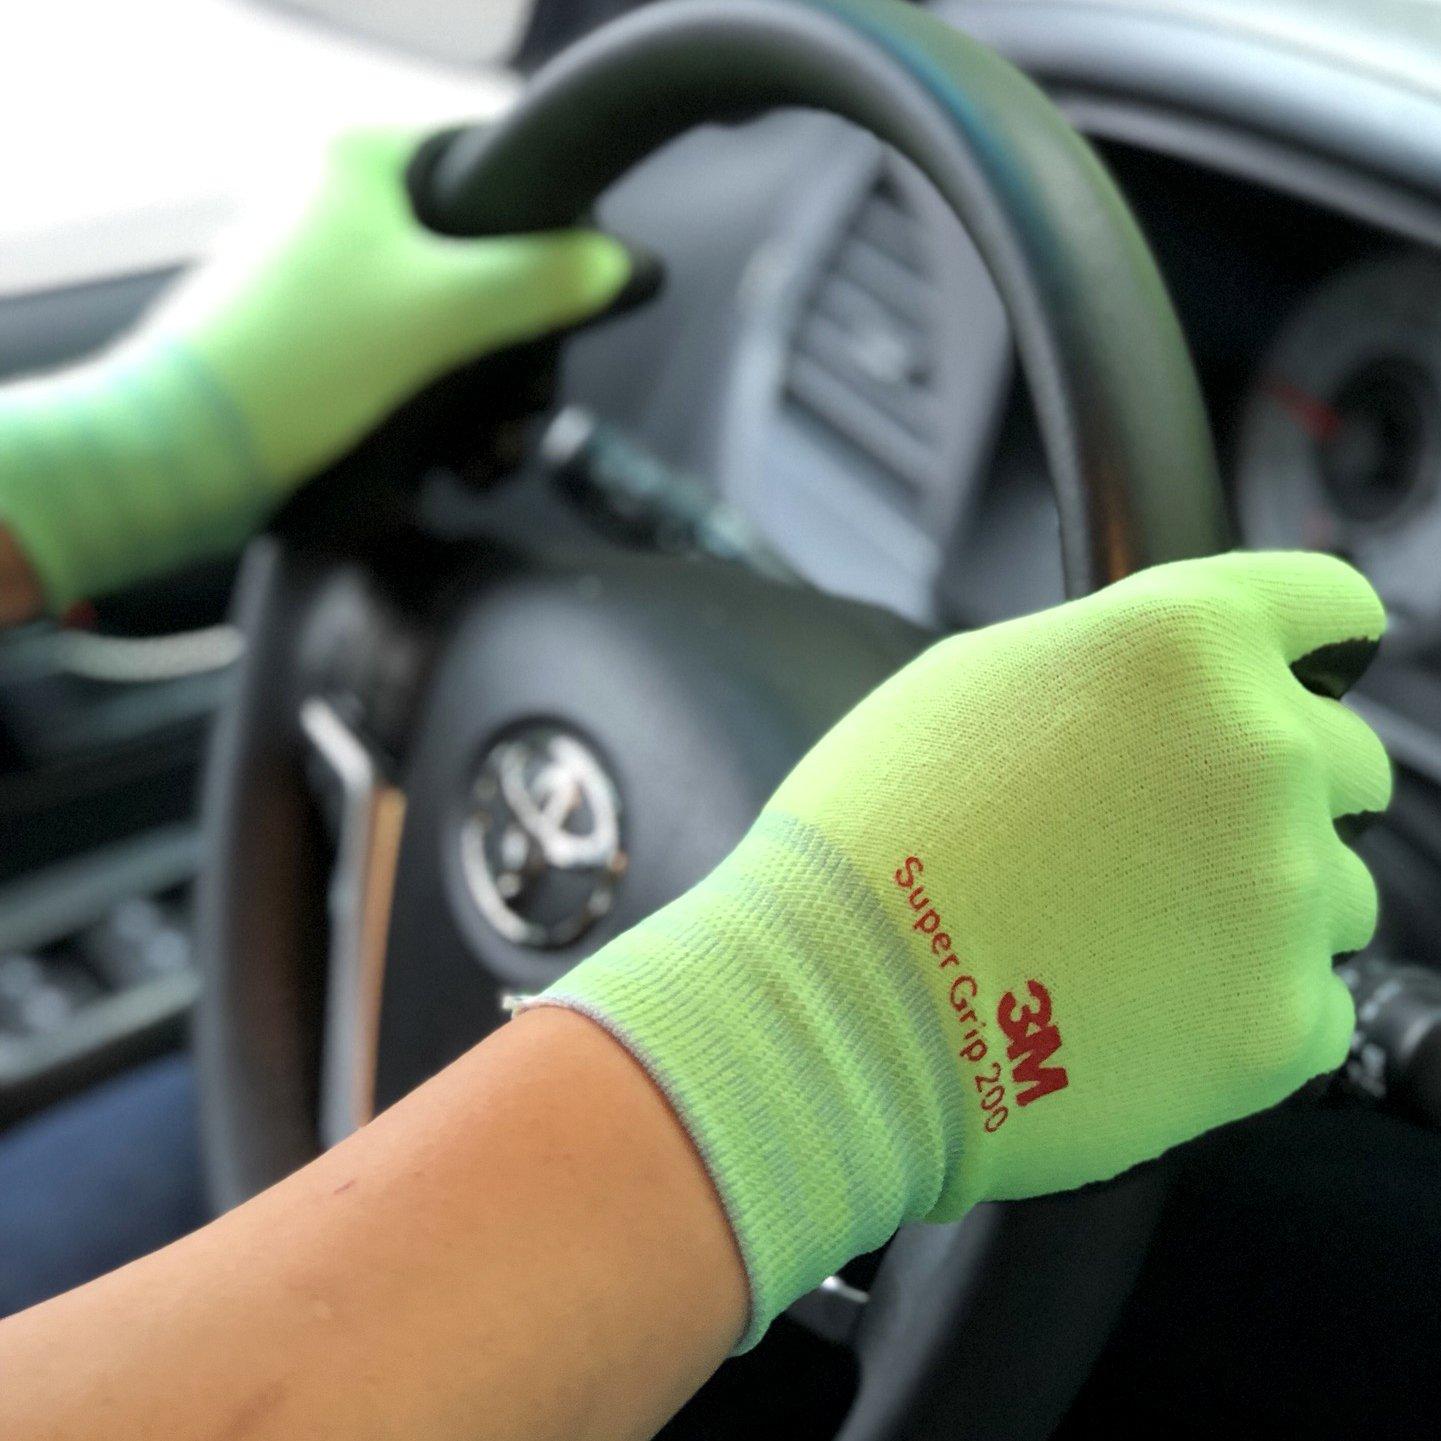 3M Super Grip Garden Work Gloves- 3 PACK (Extra Large) by 3M Super Grip (Image #3)